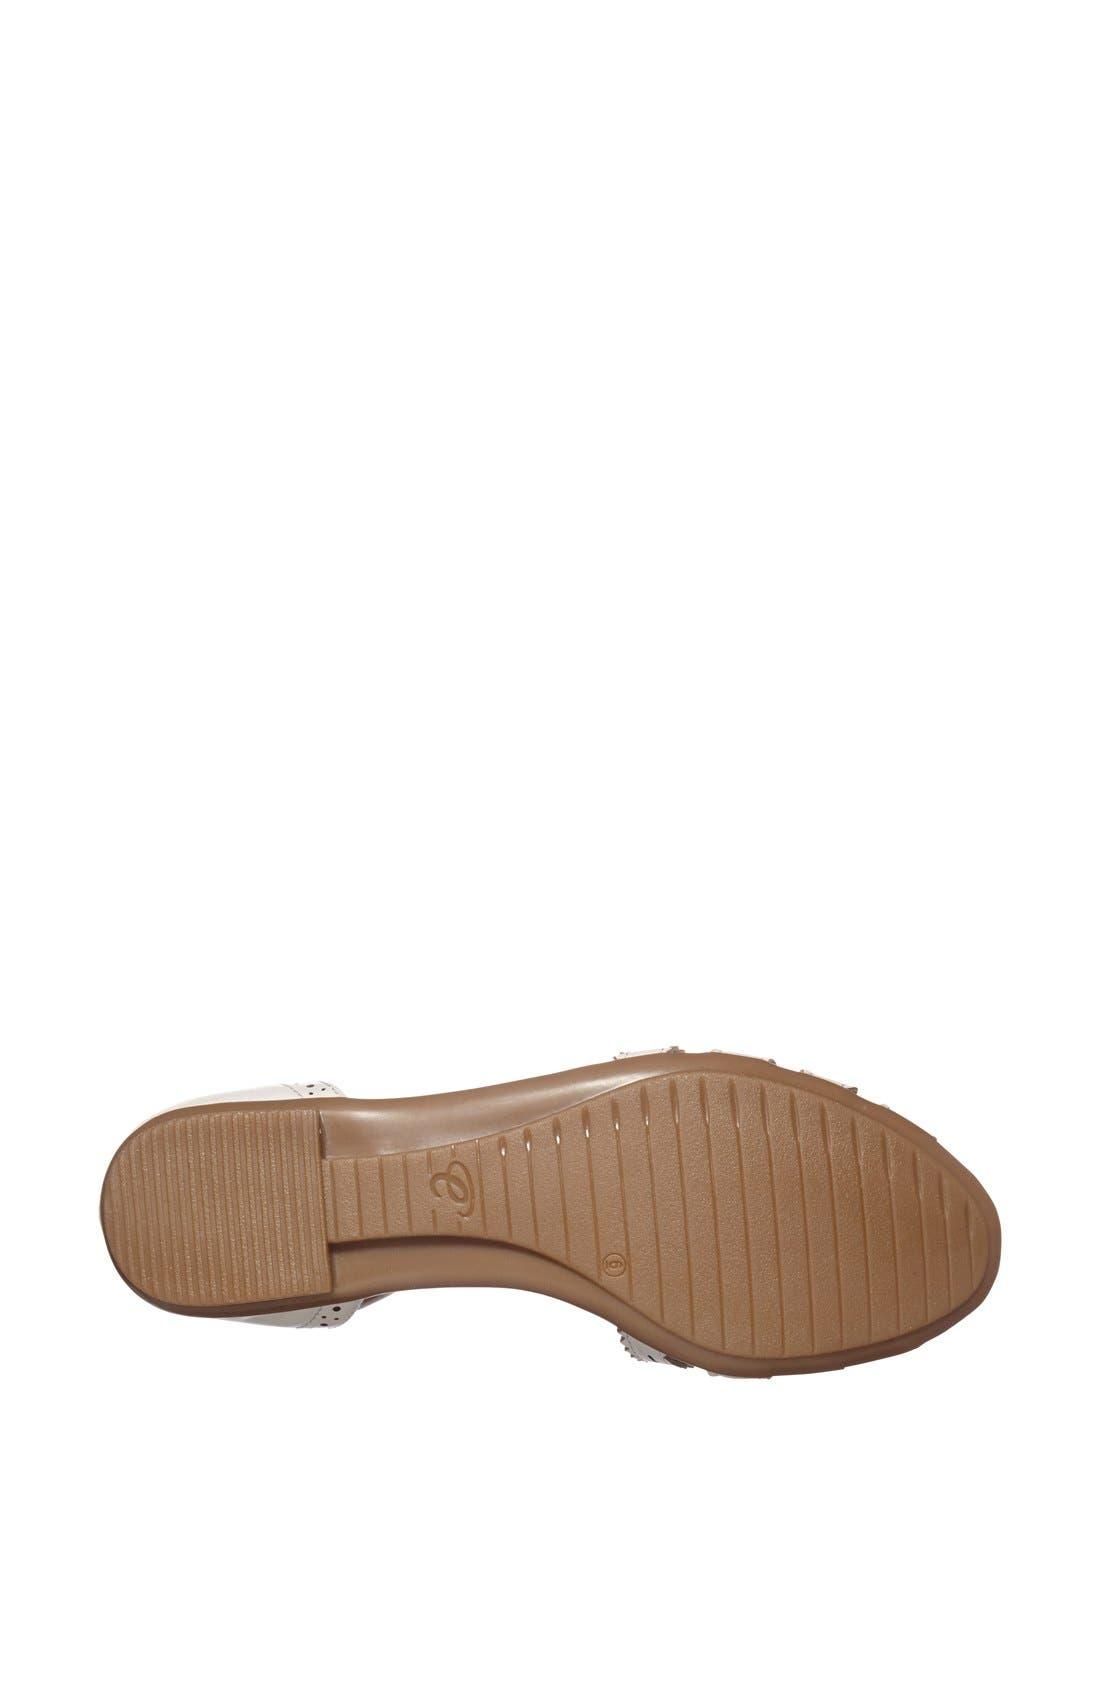 Alternate Image 4  - Easy Spirit 'e360 - Galfriday' Pinked & Perforated Leather Quarter Strap Sandal (Women)